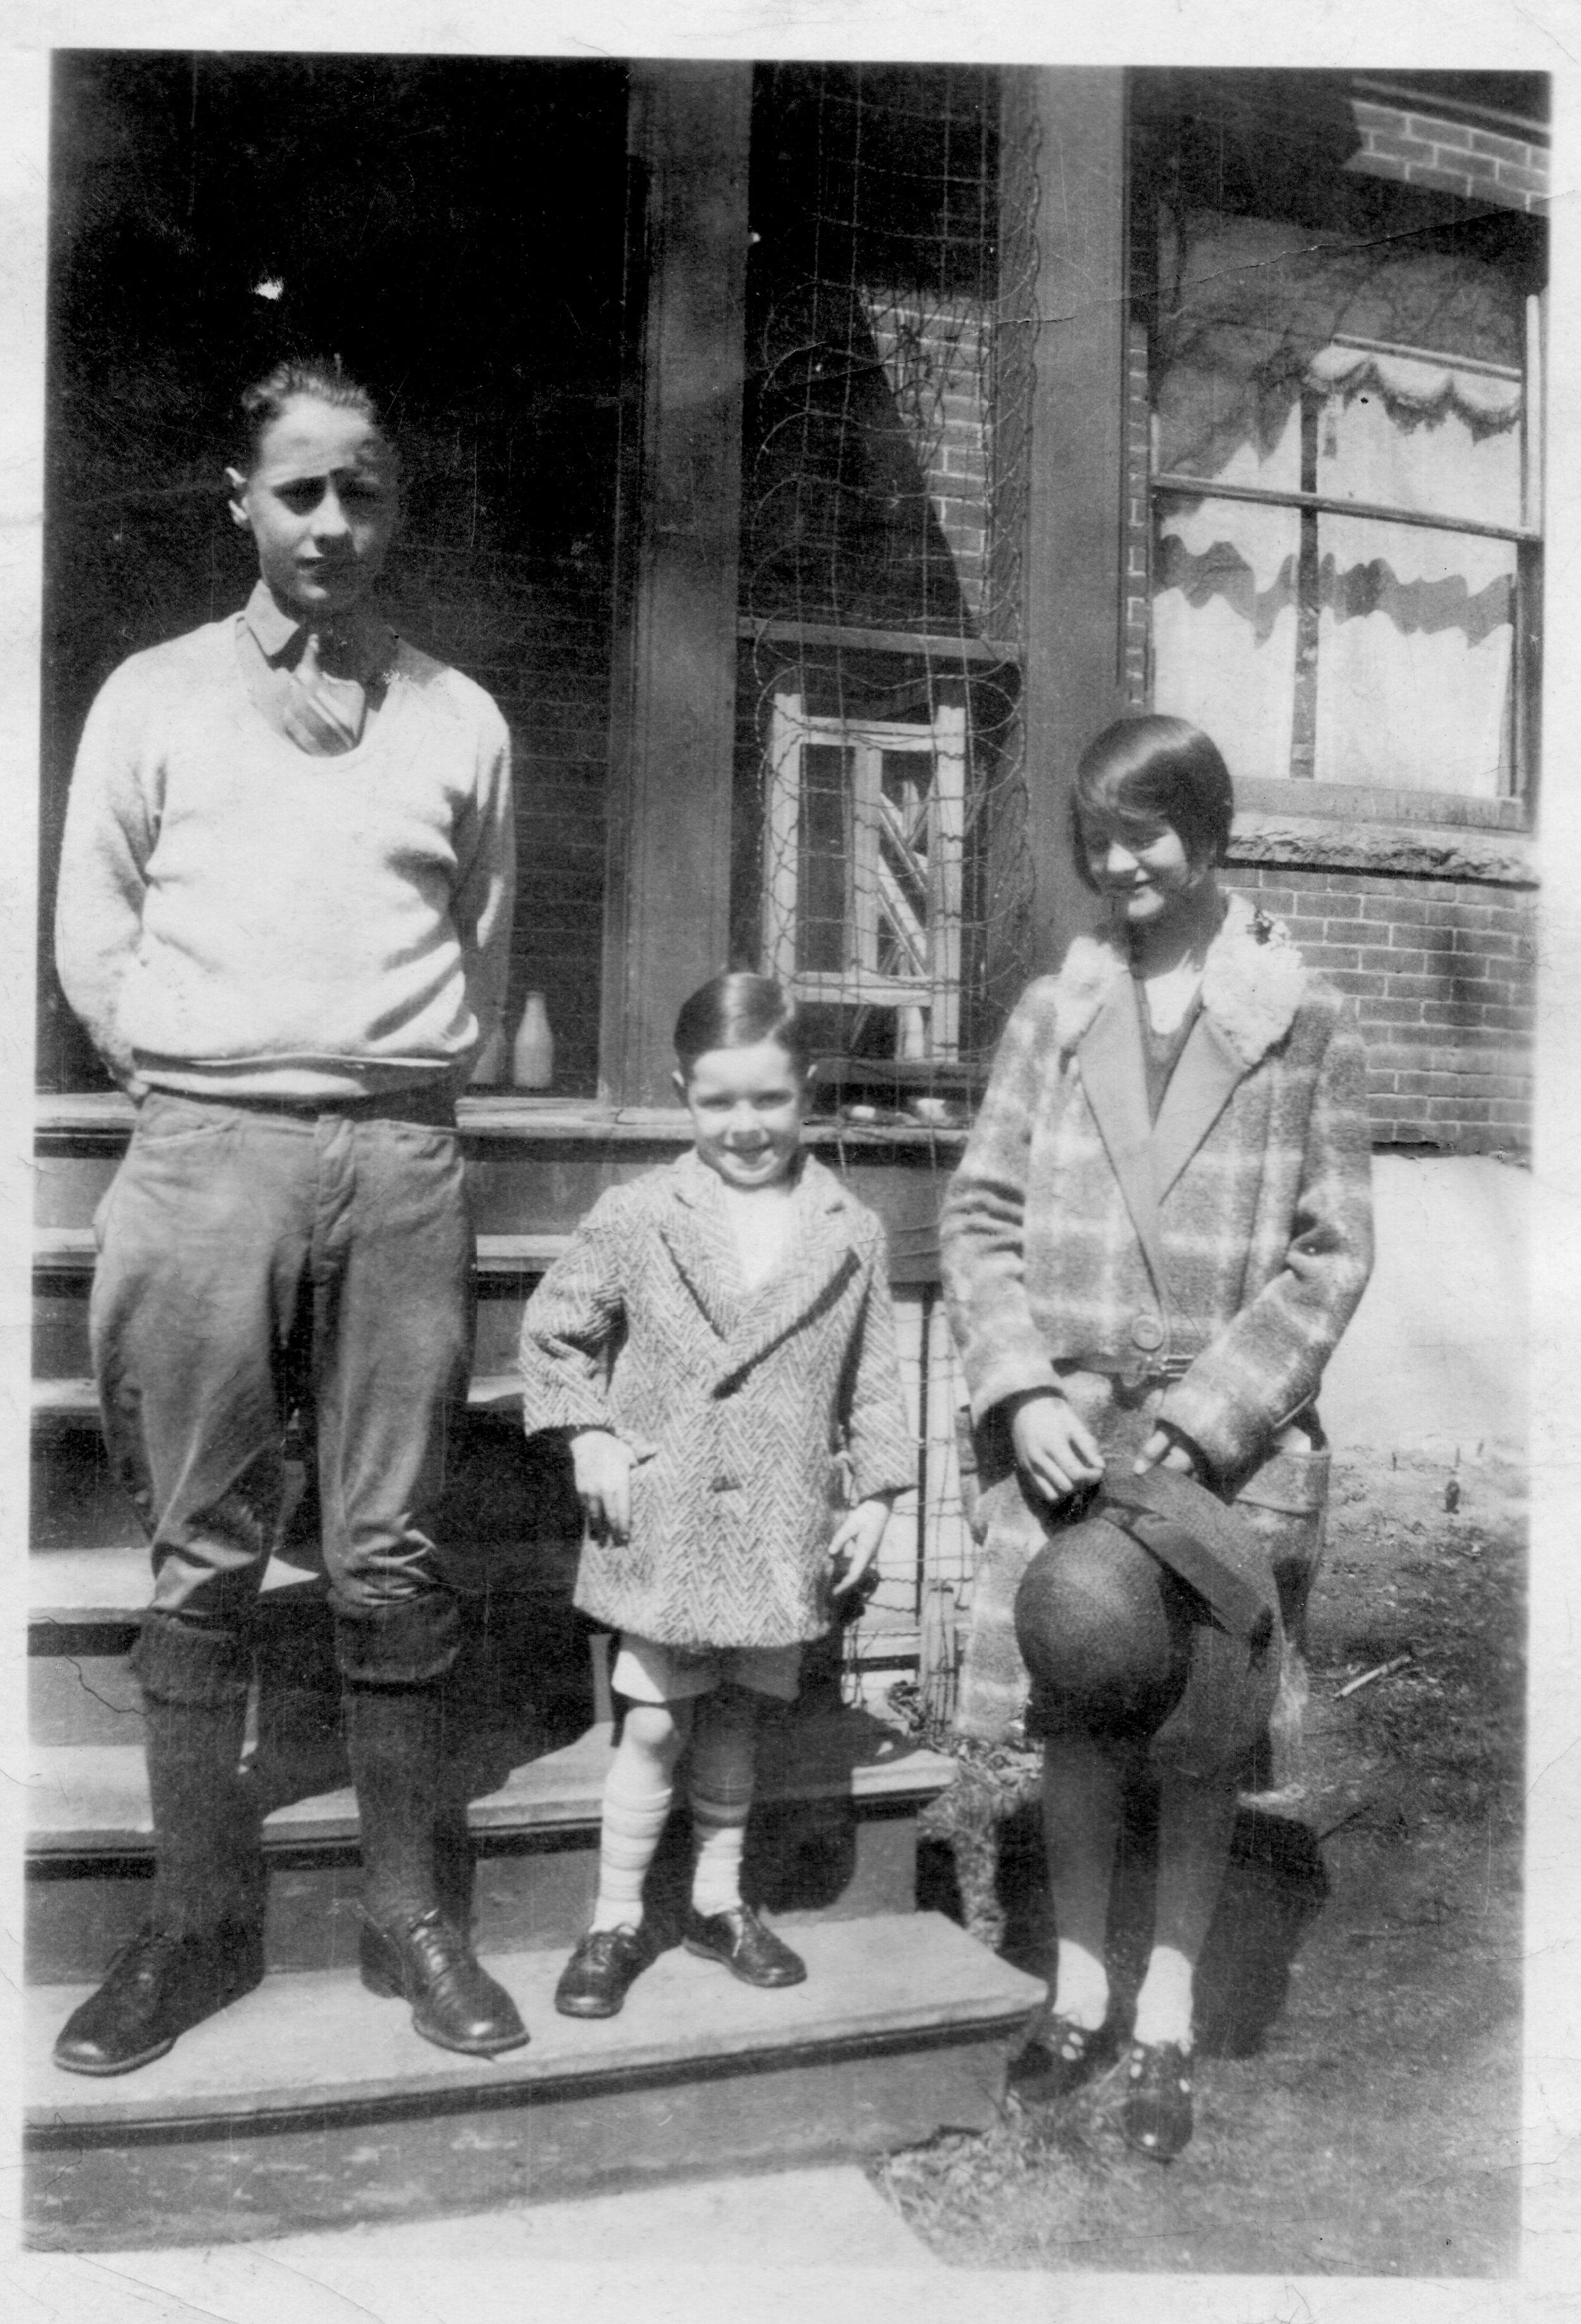 Jack Roby, Jack Holman & Frances Roby